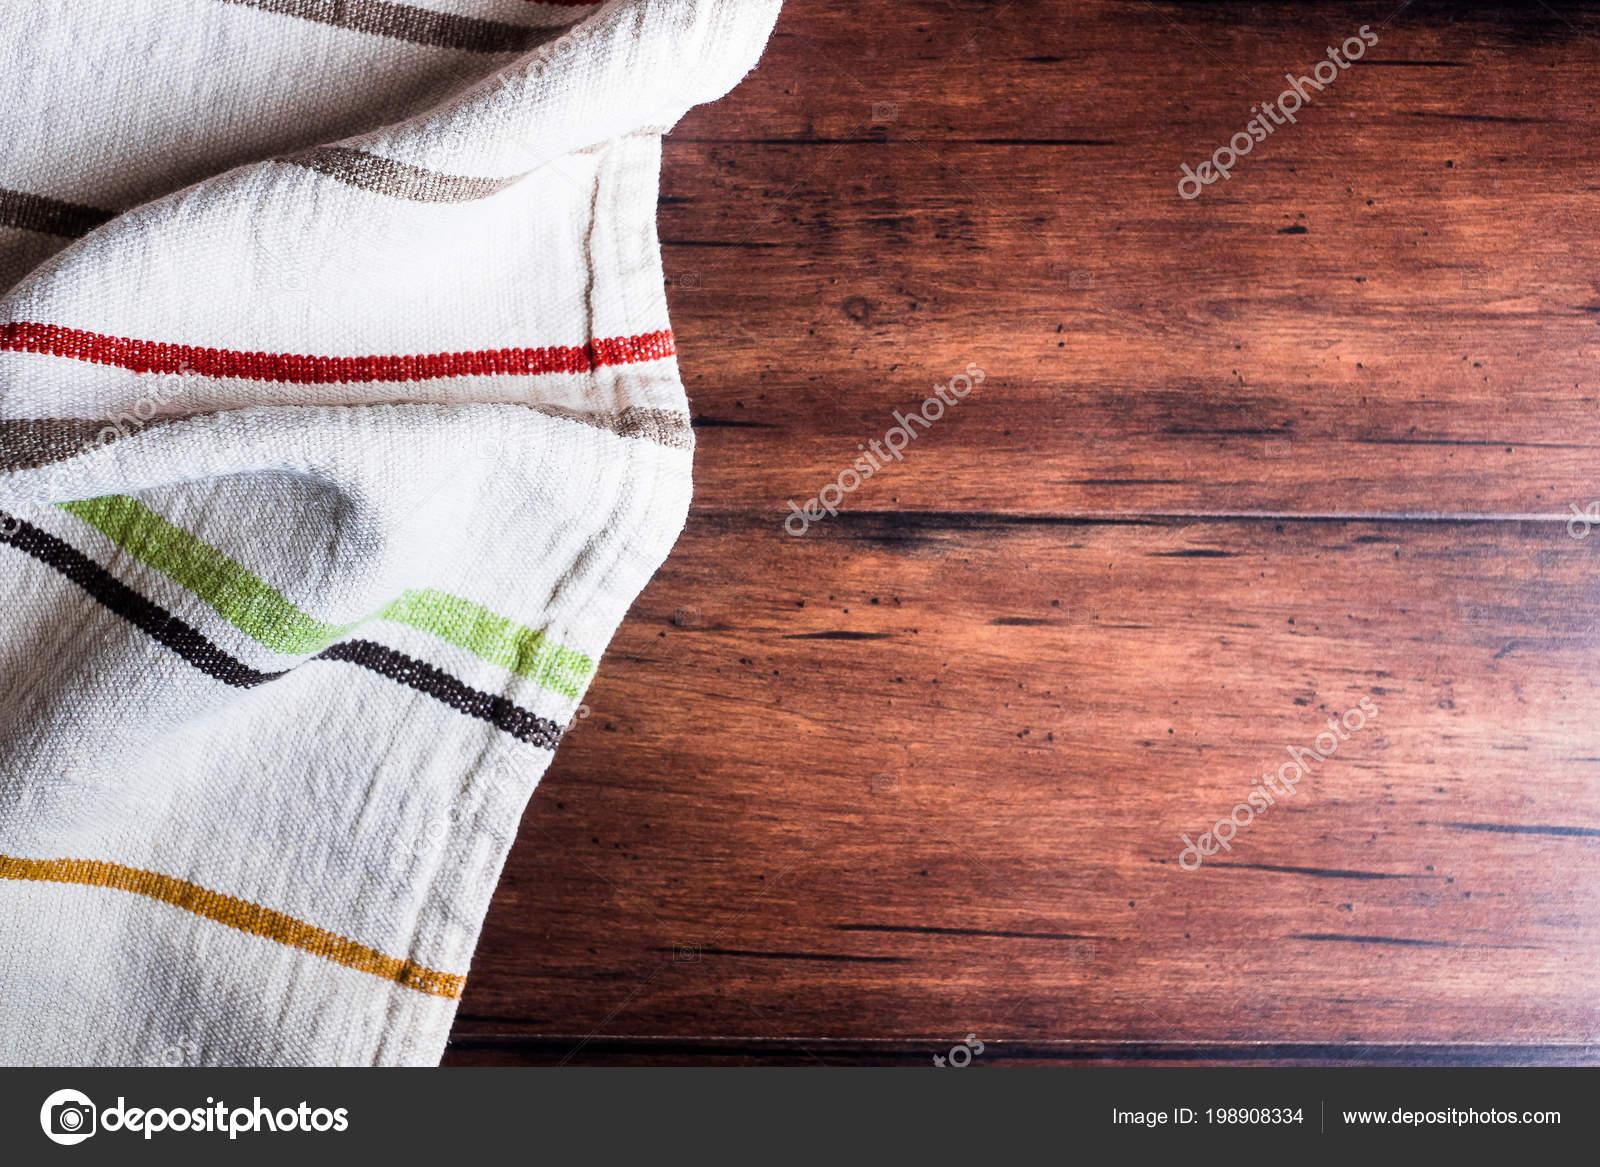 kitchen linens antique brass faucet 彩色条纹亚麻布在老木褐色背景顶部视图具有复制空间的图像带有复制空间的 彩色条纹亚麻布在老木褐色背景 顶部视图 具有复制空间的图像 带有复制空间的毛巾顶部视图的厨房表 照片作者anna mavritta